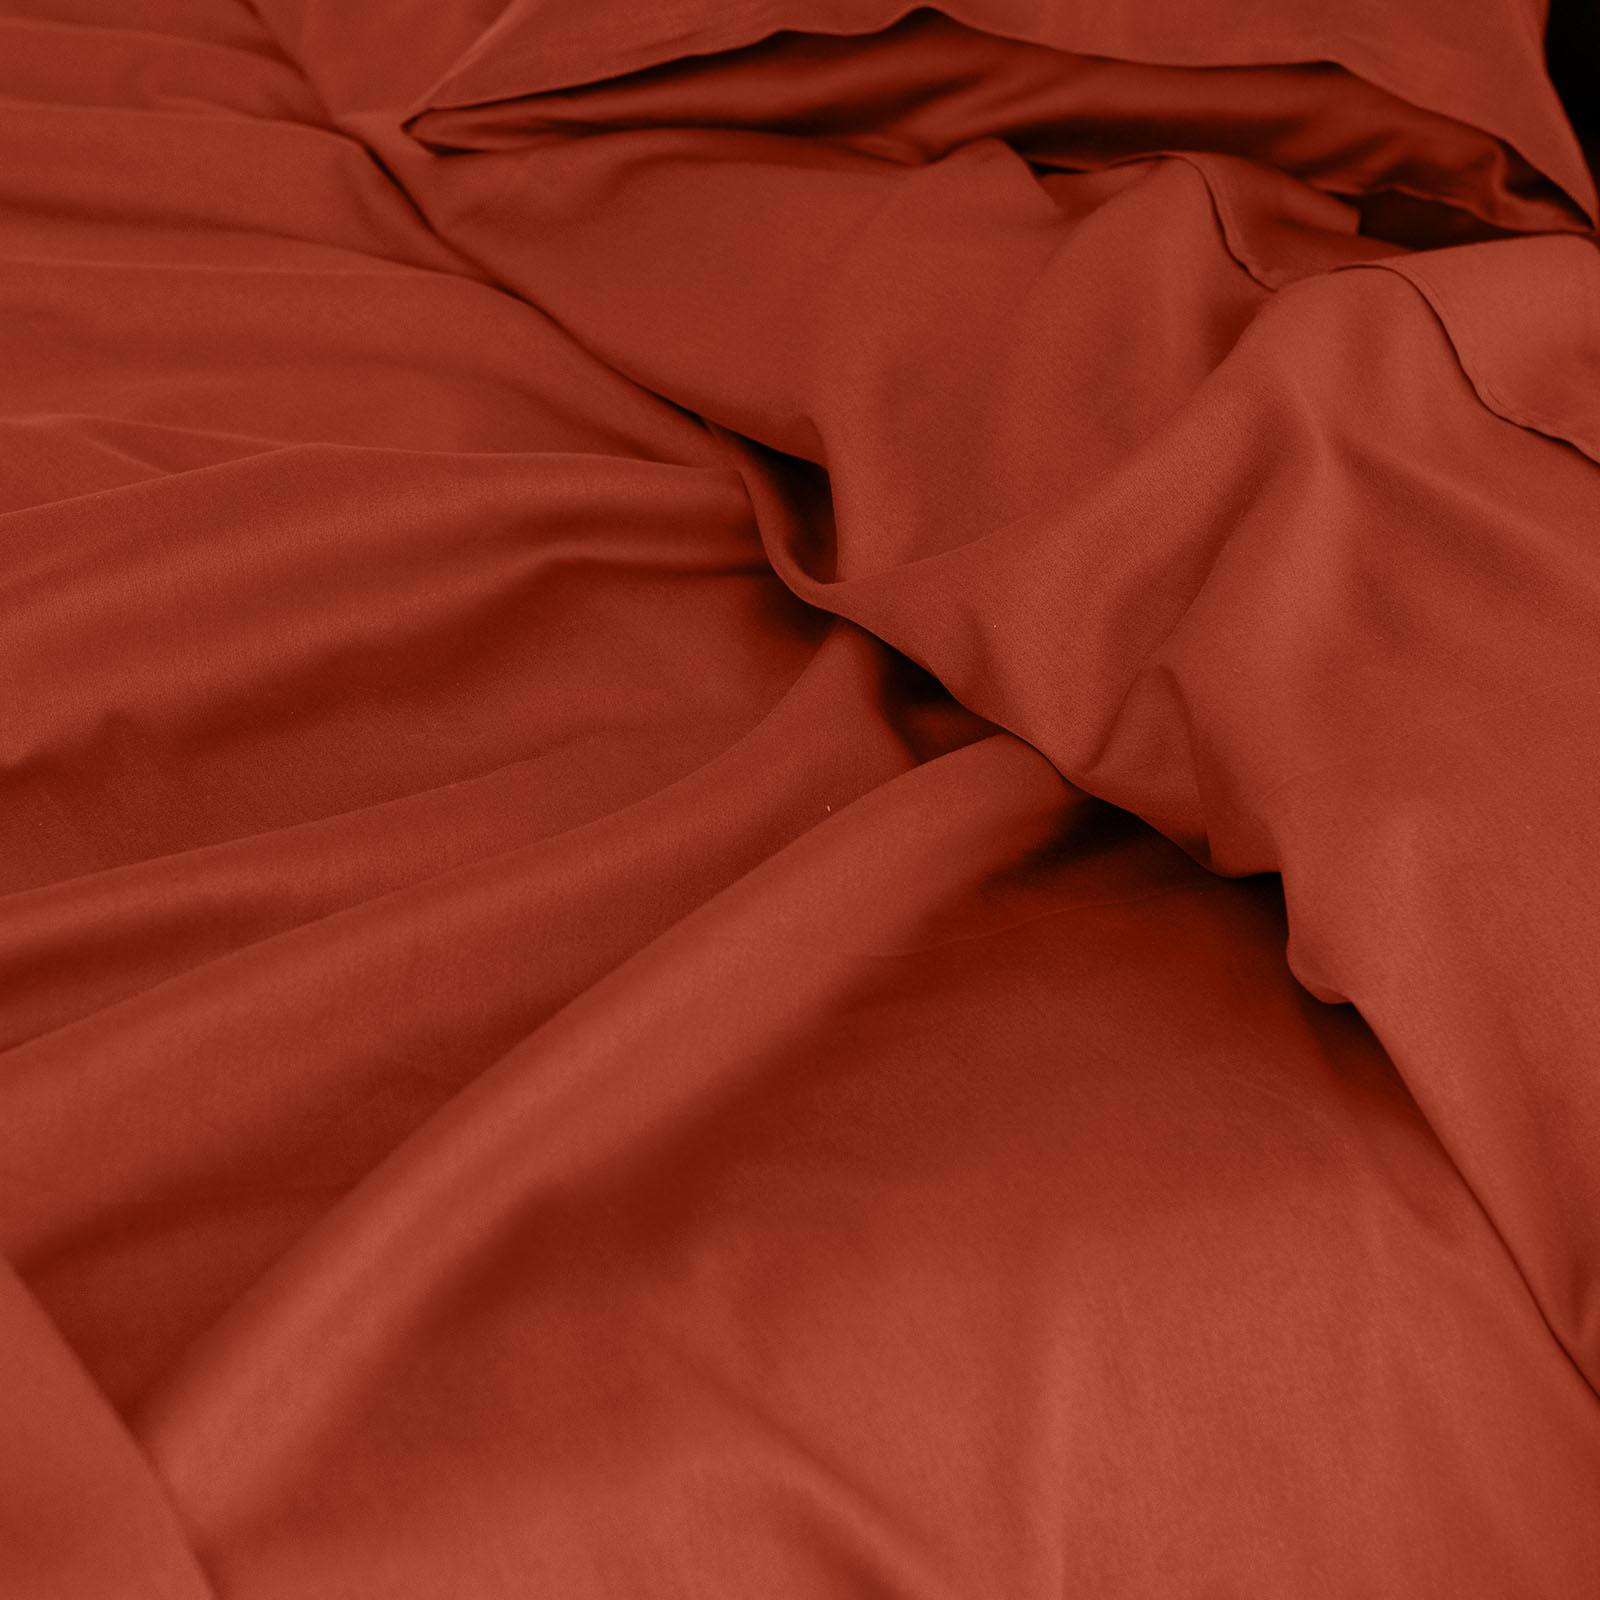 thumbnail 37 - Royal Comfort 1000TC Hotel Grade Bamboo Cotton Sheets Pillowcases Set Ultrasoft